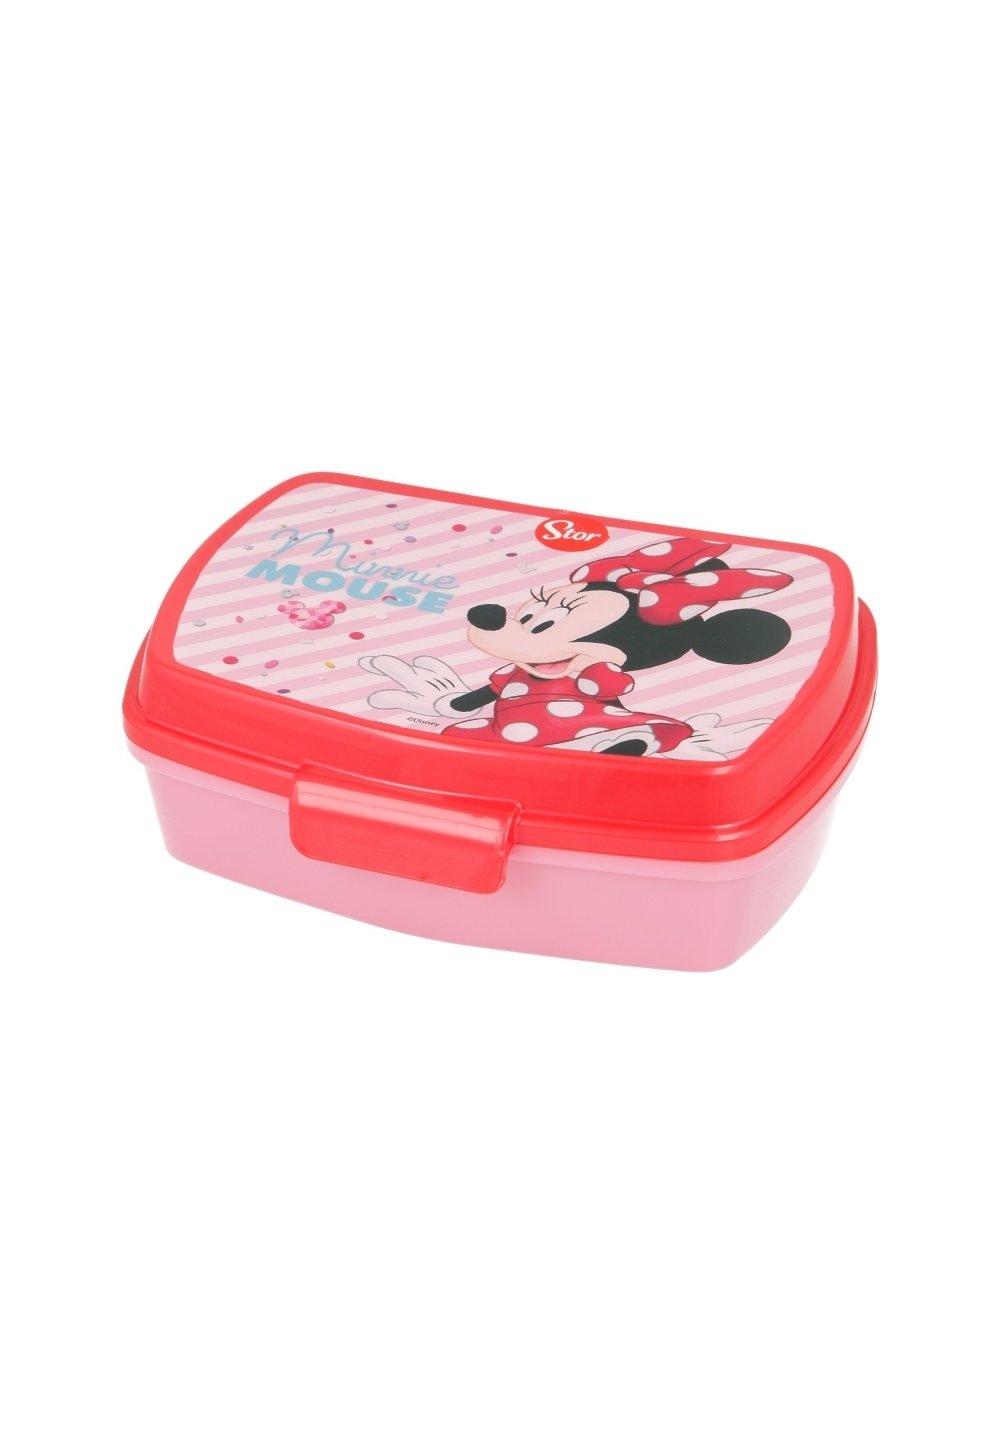 Cutie alimentara, Minnie Mouse imagine